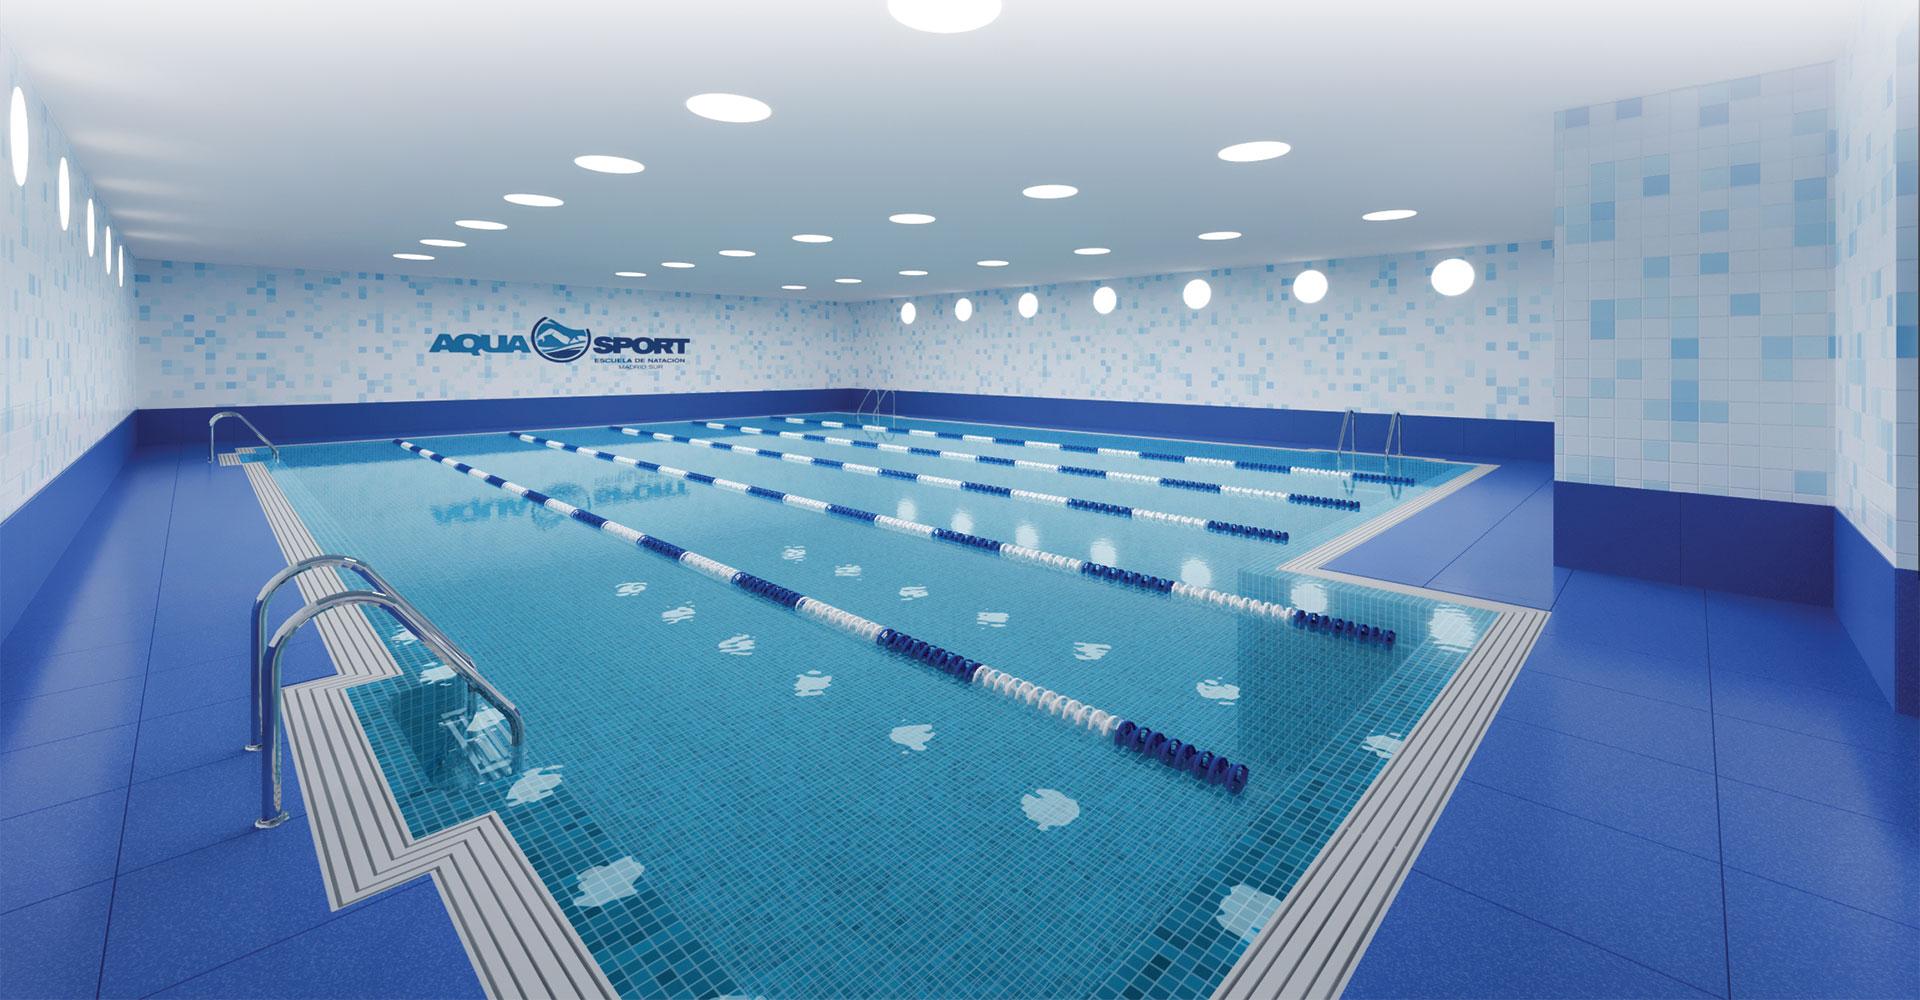 Aquasport escuela de nataci n madrid sur escuela de for Piscina bebes madrid